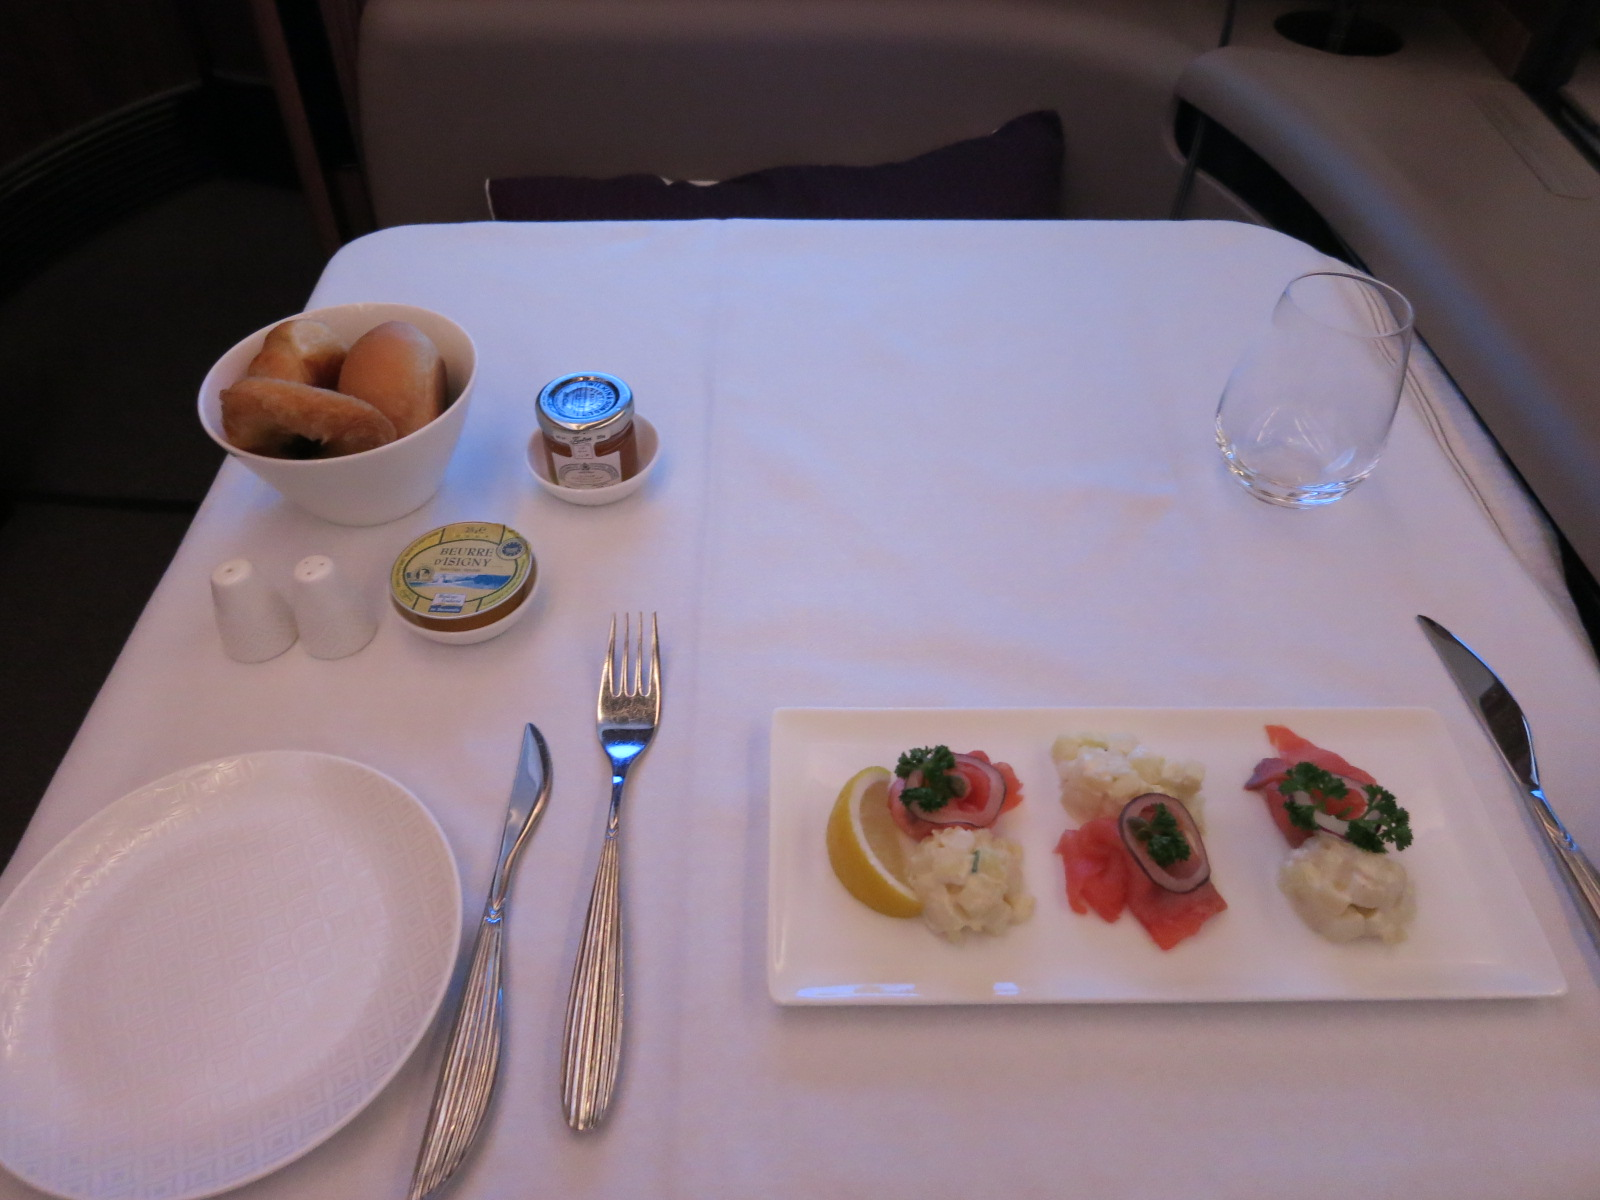 Qatar Airways A380 first class meal service Bangkok-Doha